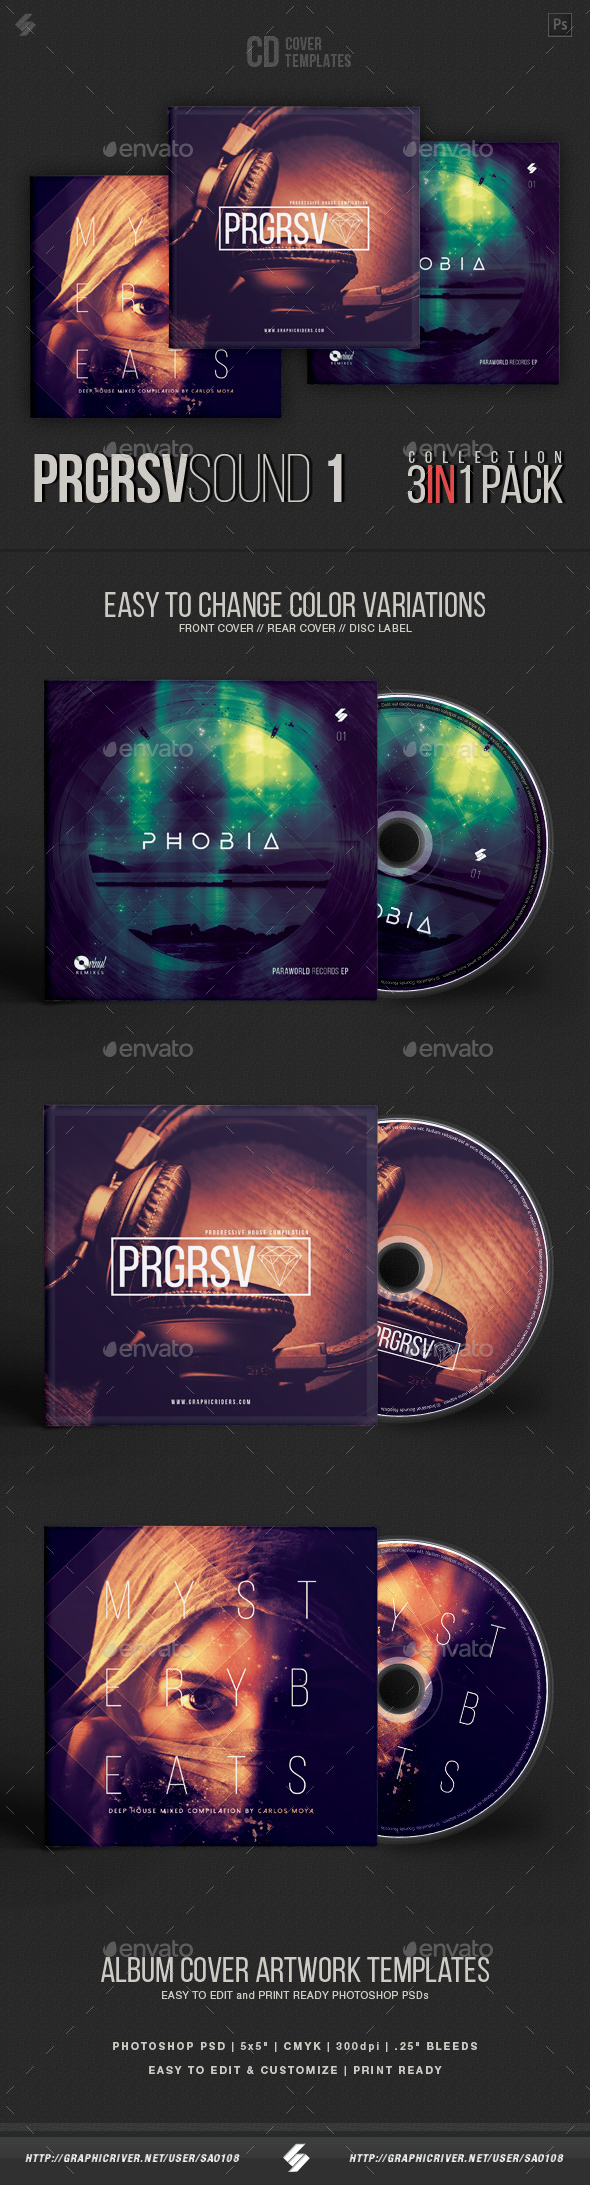 Progressive Sound Collection - CD Cover Artwork Templates Bundle - CD & DVD Artwork Print Templates